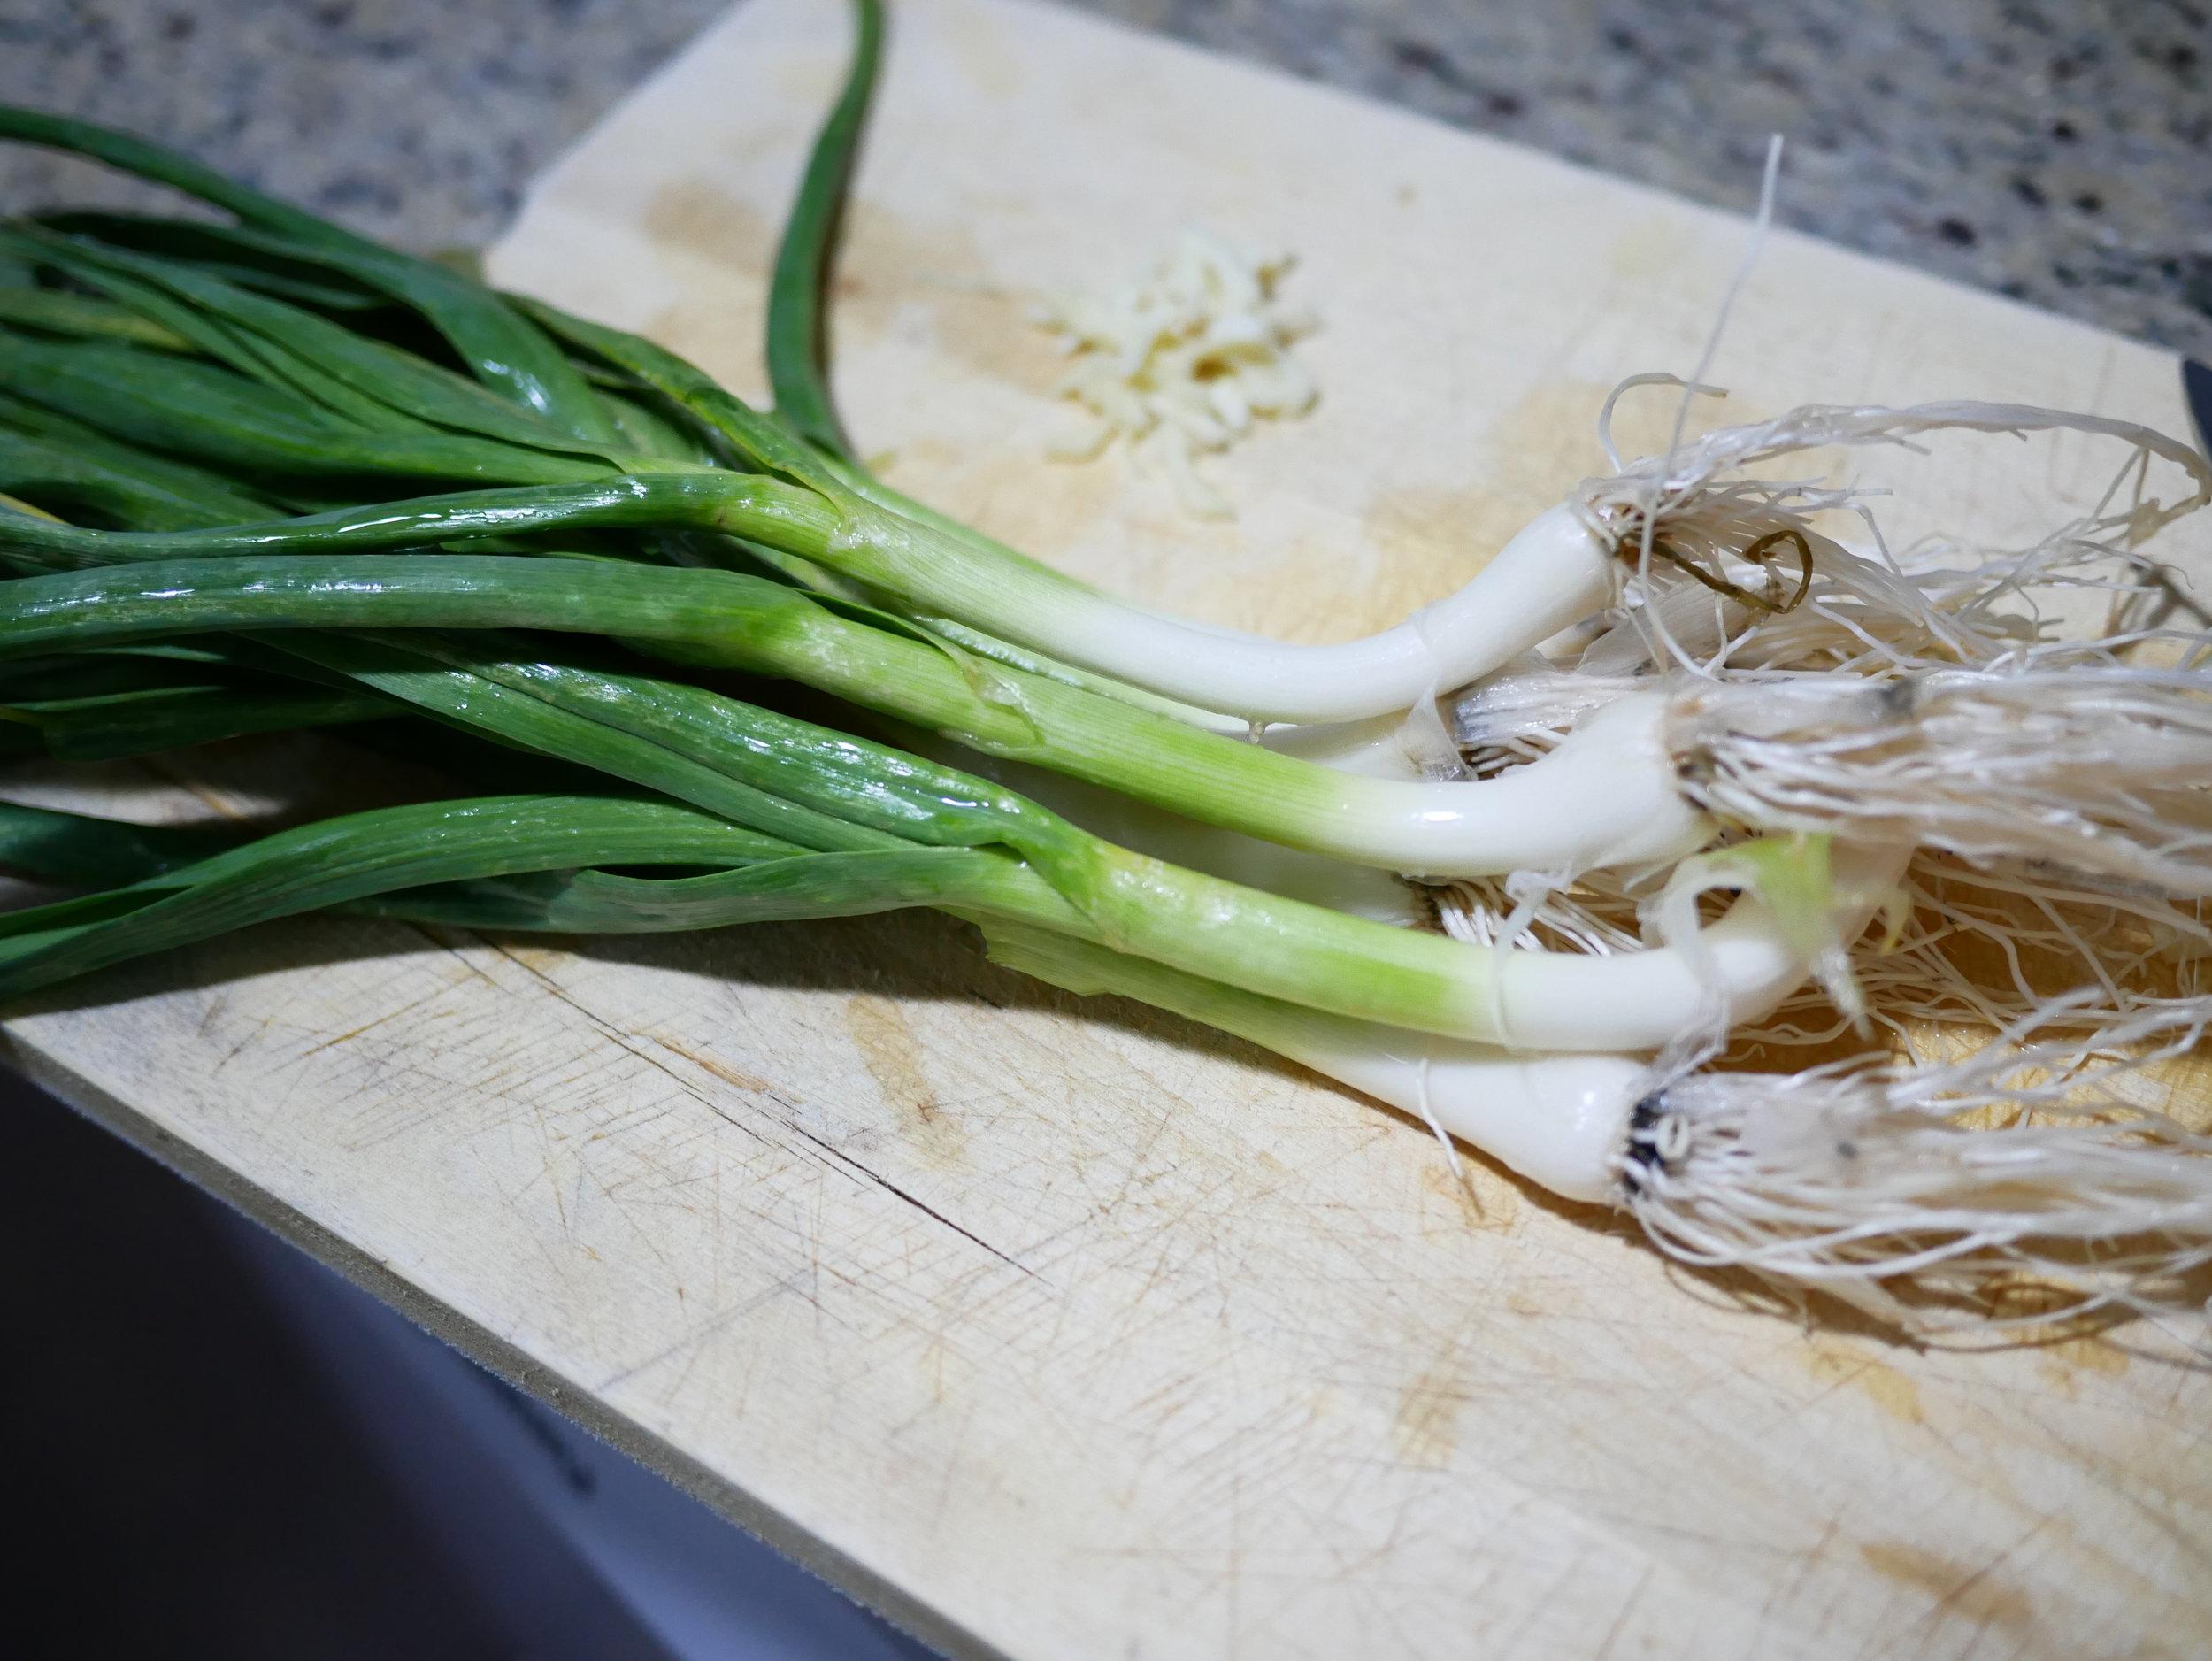 Green garlic whole